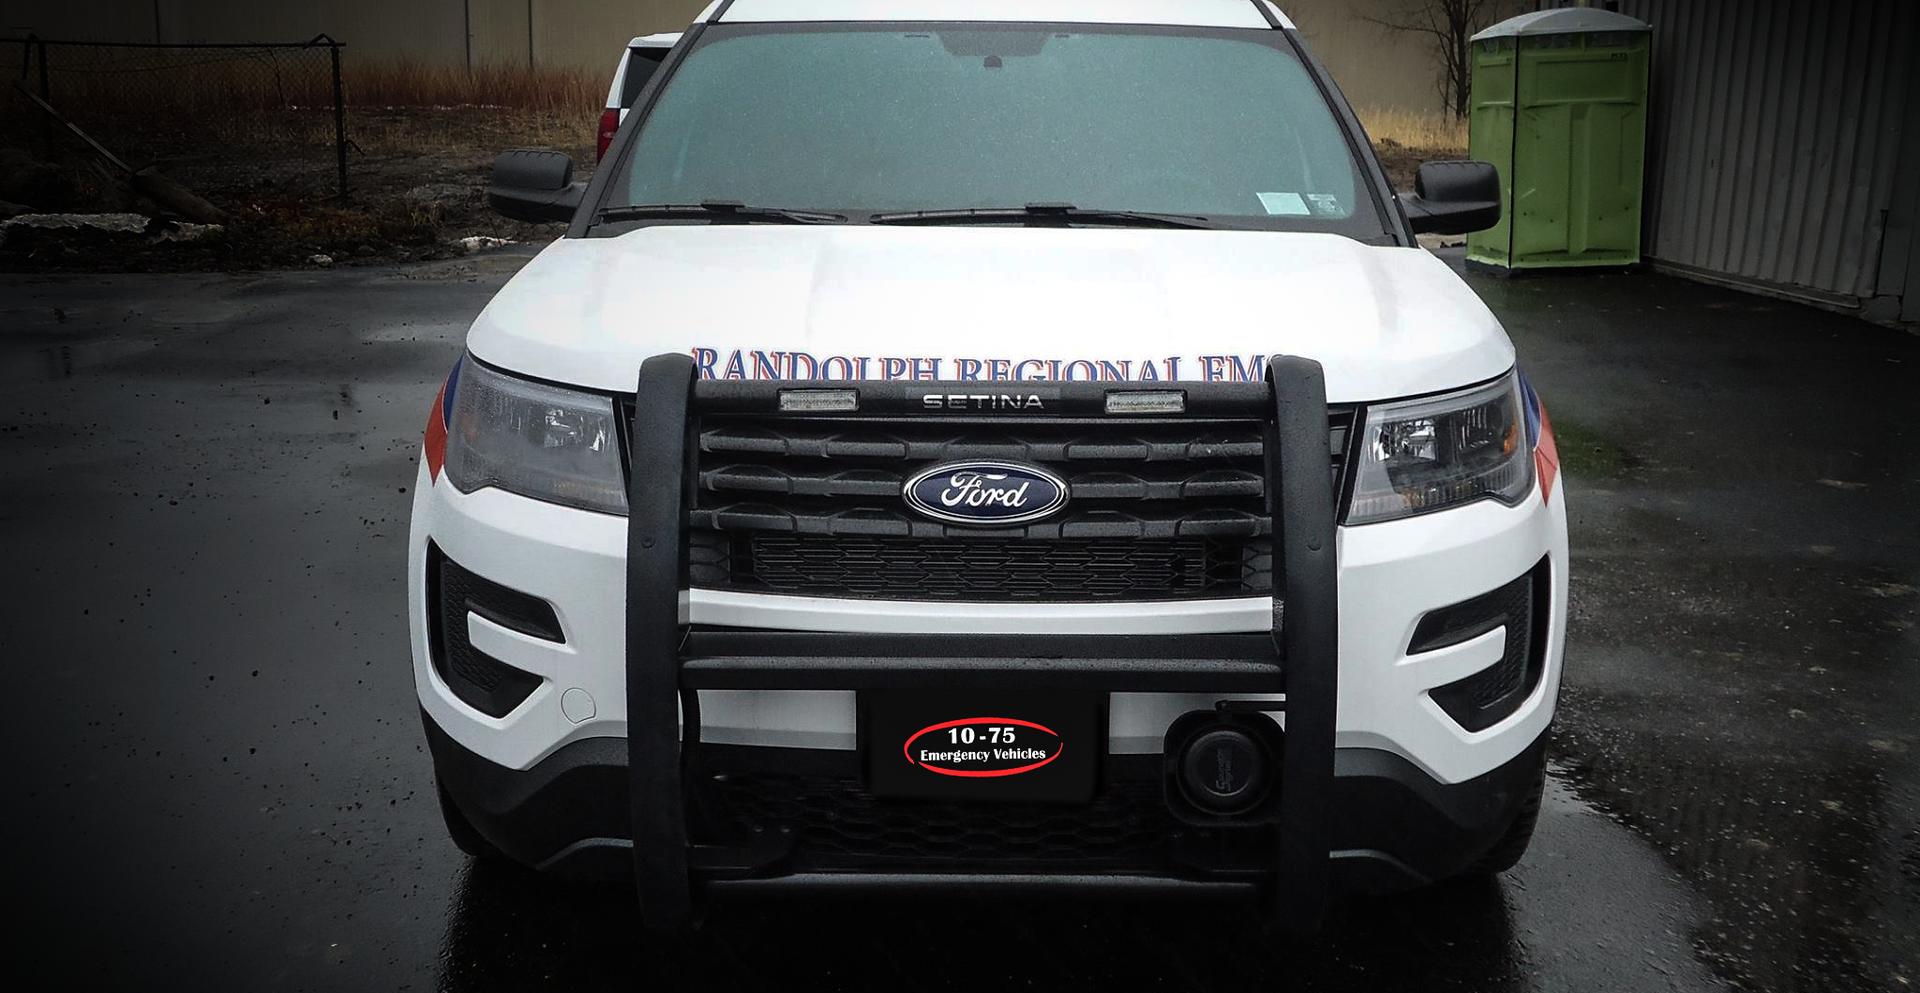 Randolph Regional EMS